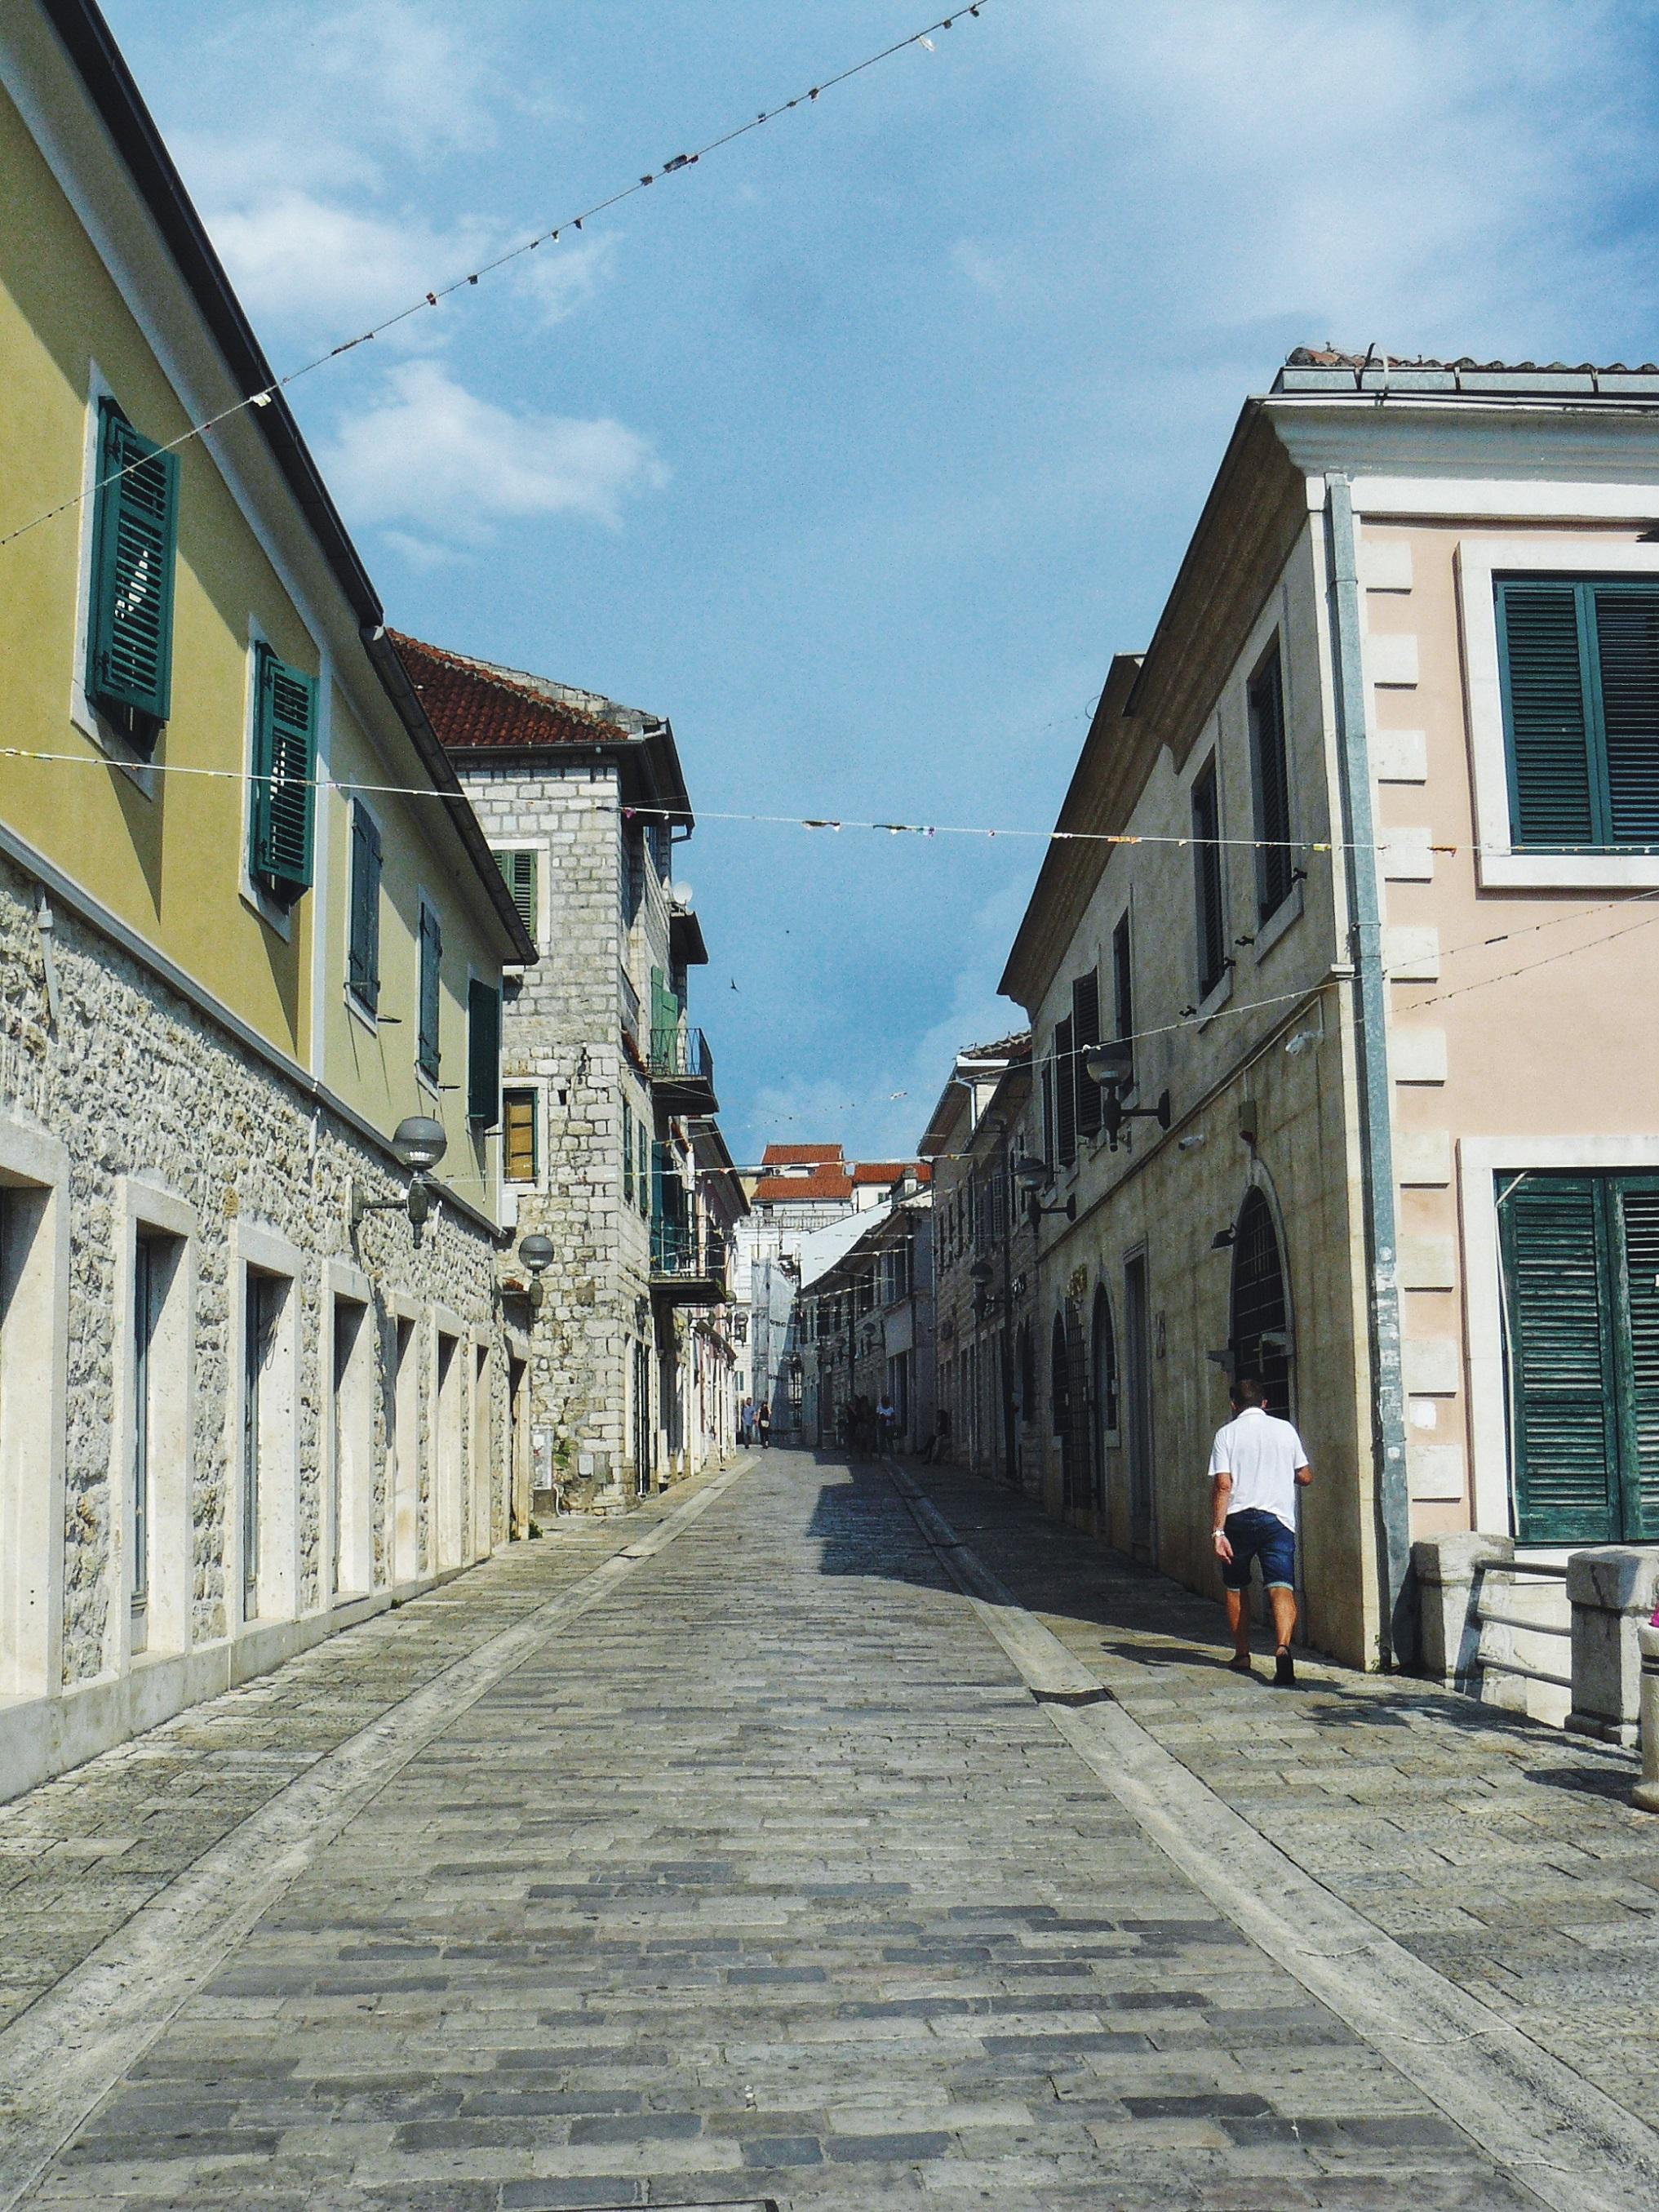 Outlandish blog travel holiday Montenegro beach road trip